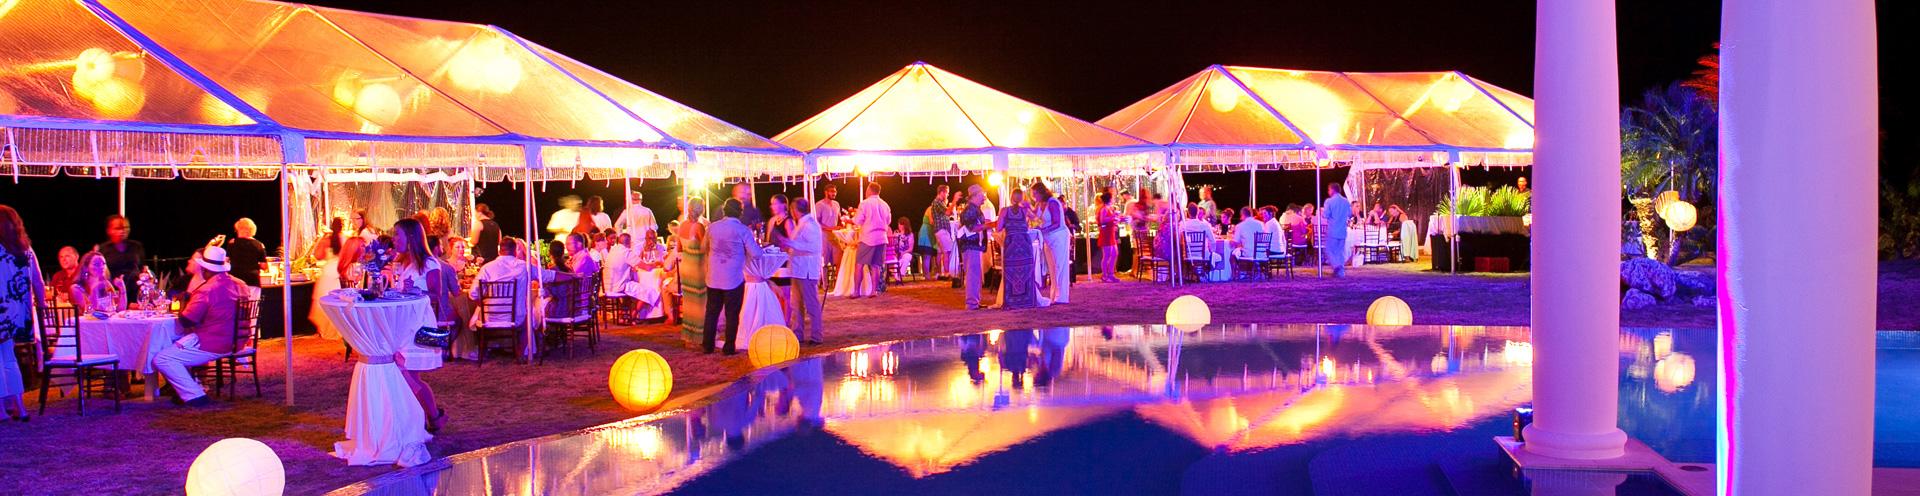 Event Management Company in Noida - Star Utsav Events